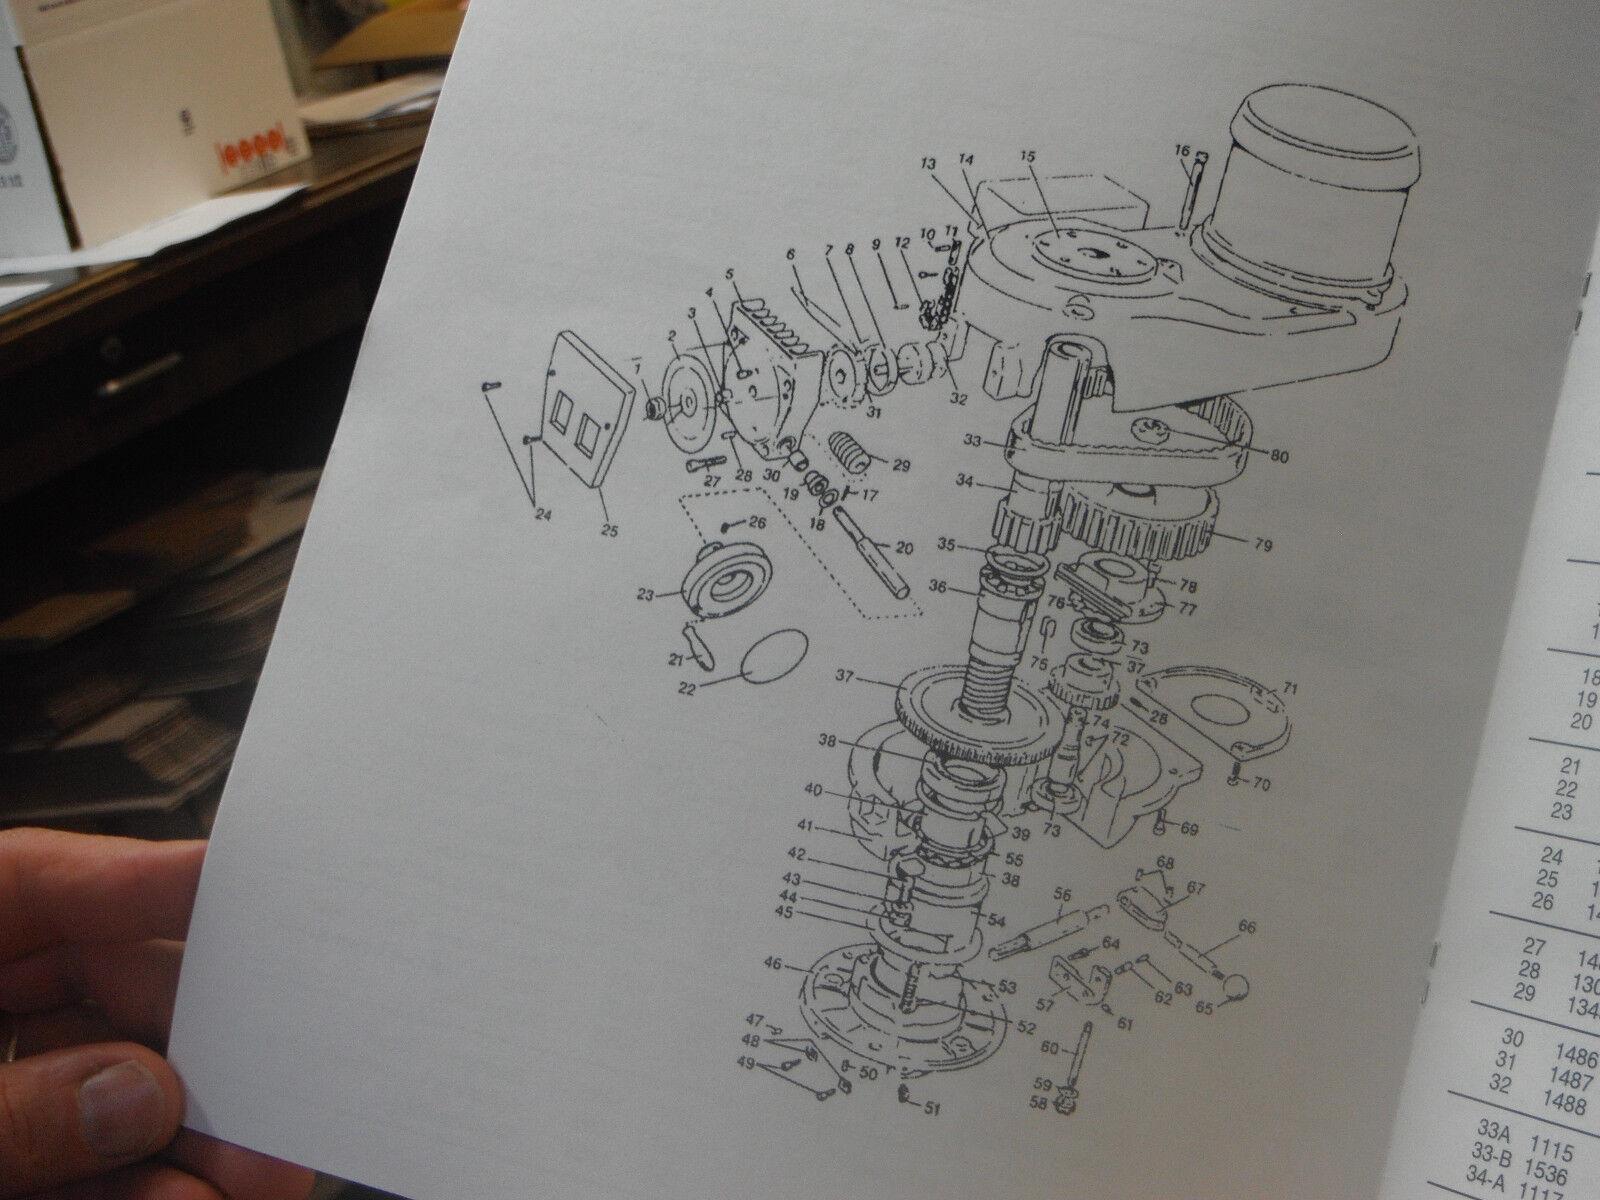 bridgeport milling machine replacement parts